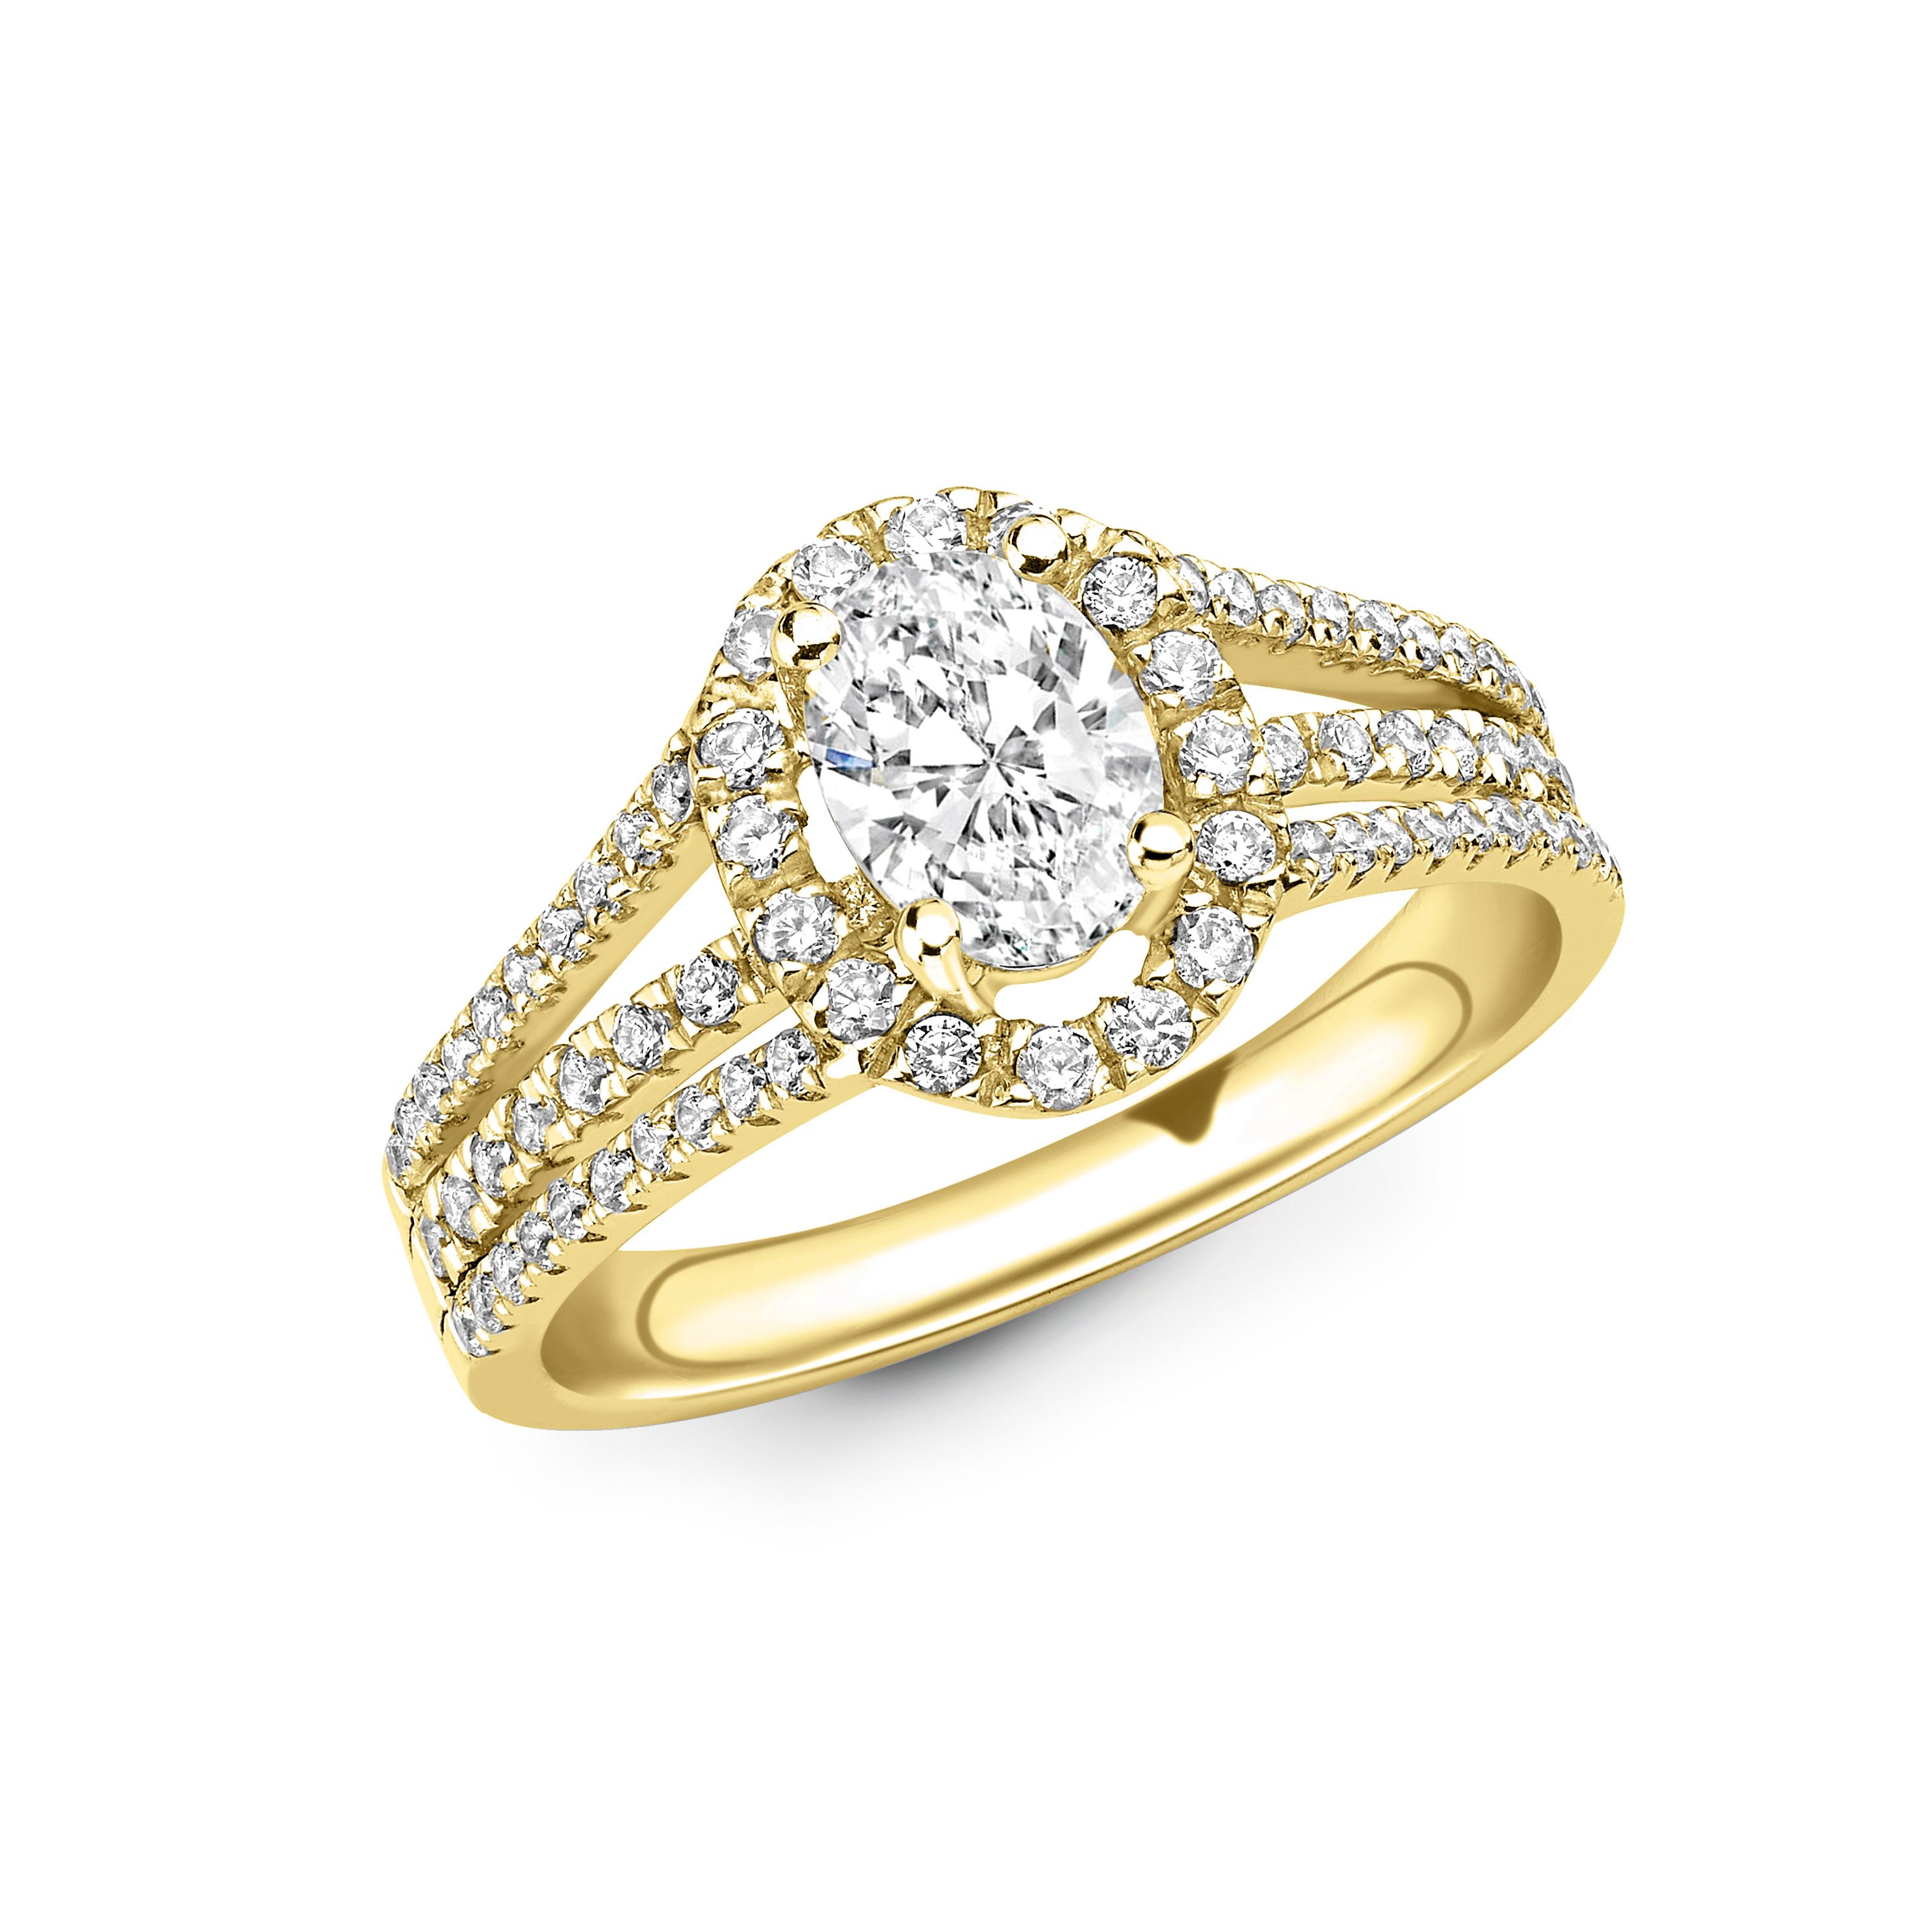 4 Prong Setting Oval Shape 3 Raw Shoulder Halo Diamond Engagement Rings